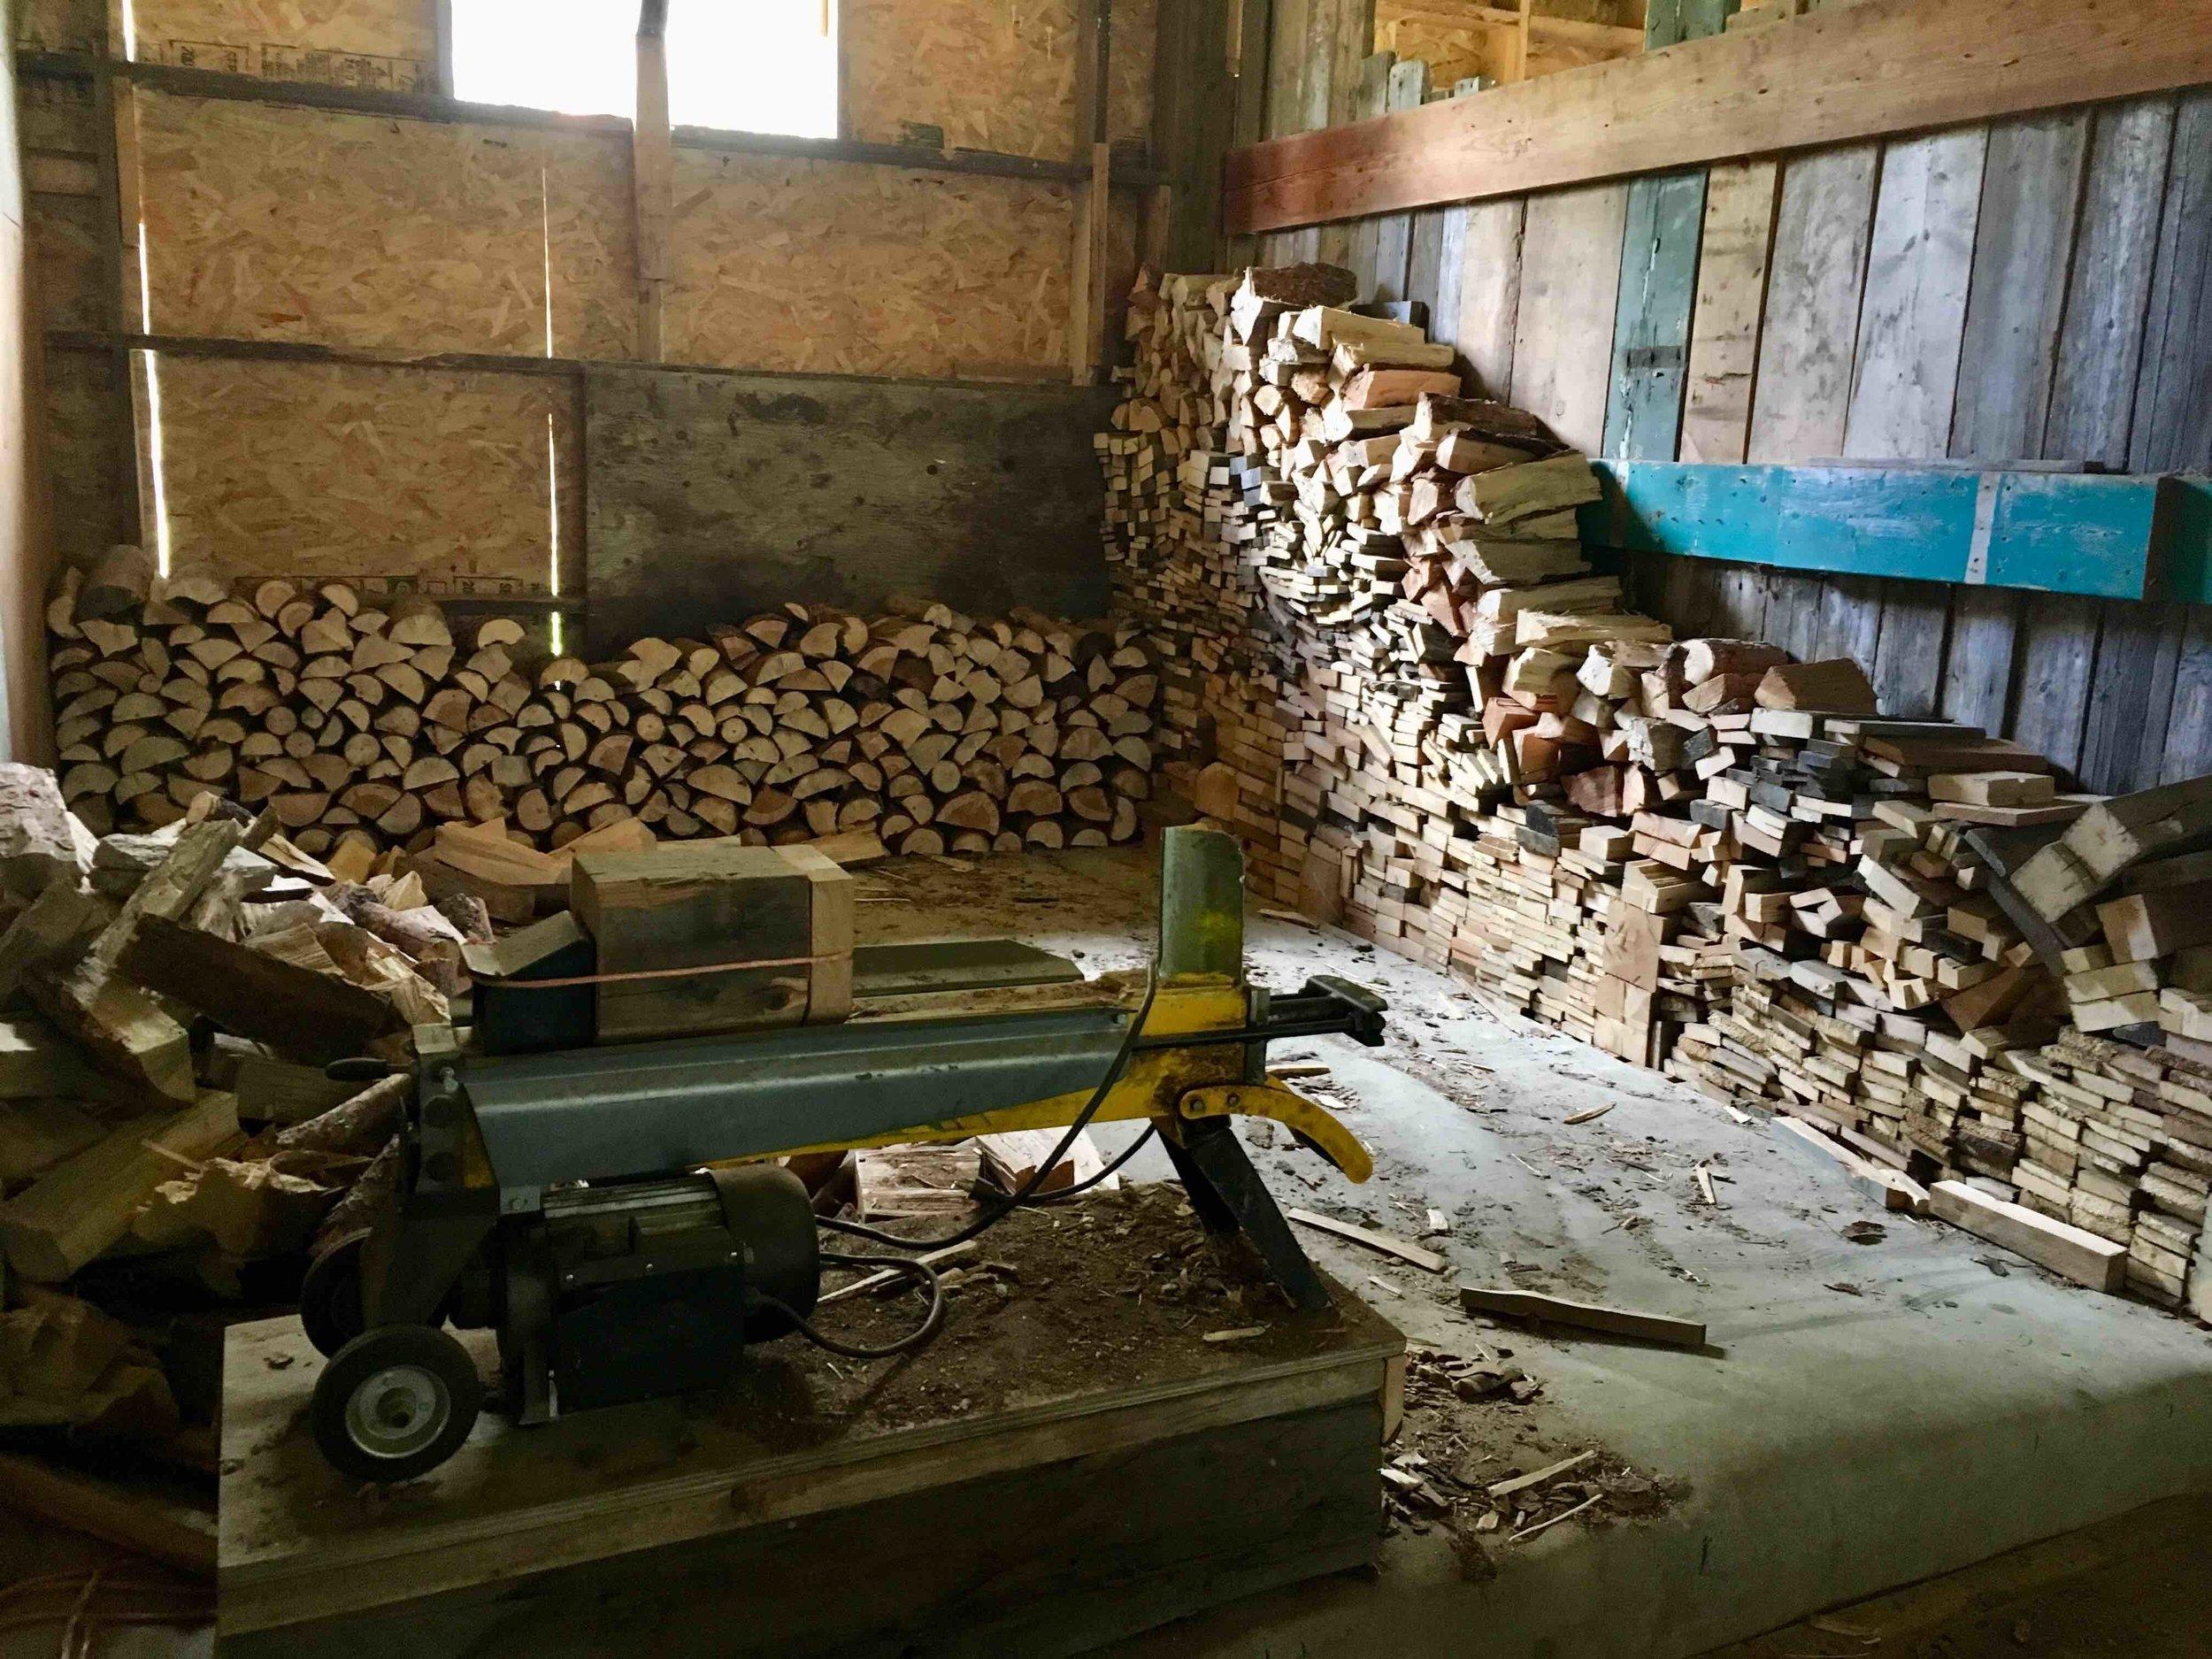 How much wood would a wood chop chop if a wood chop could chop wood?